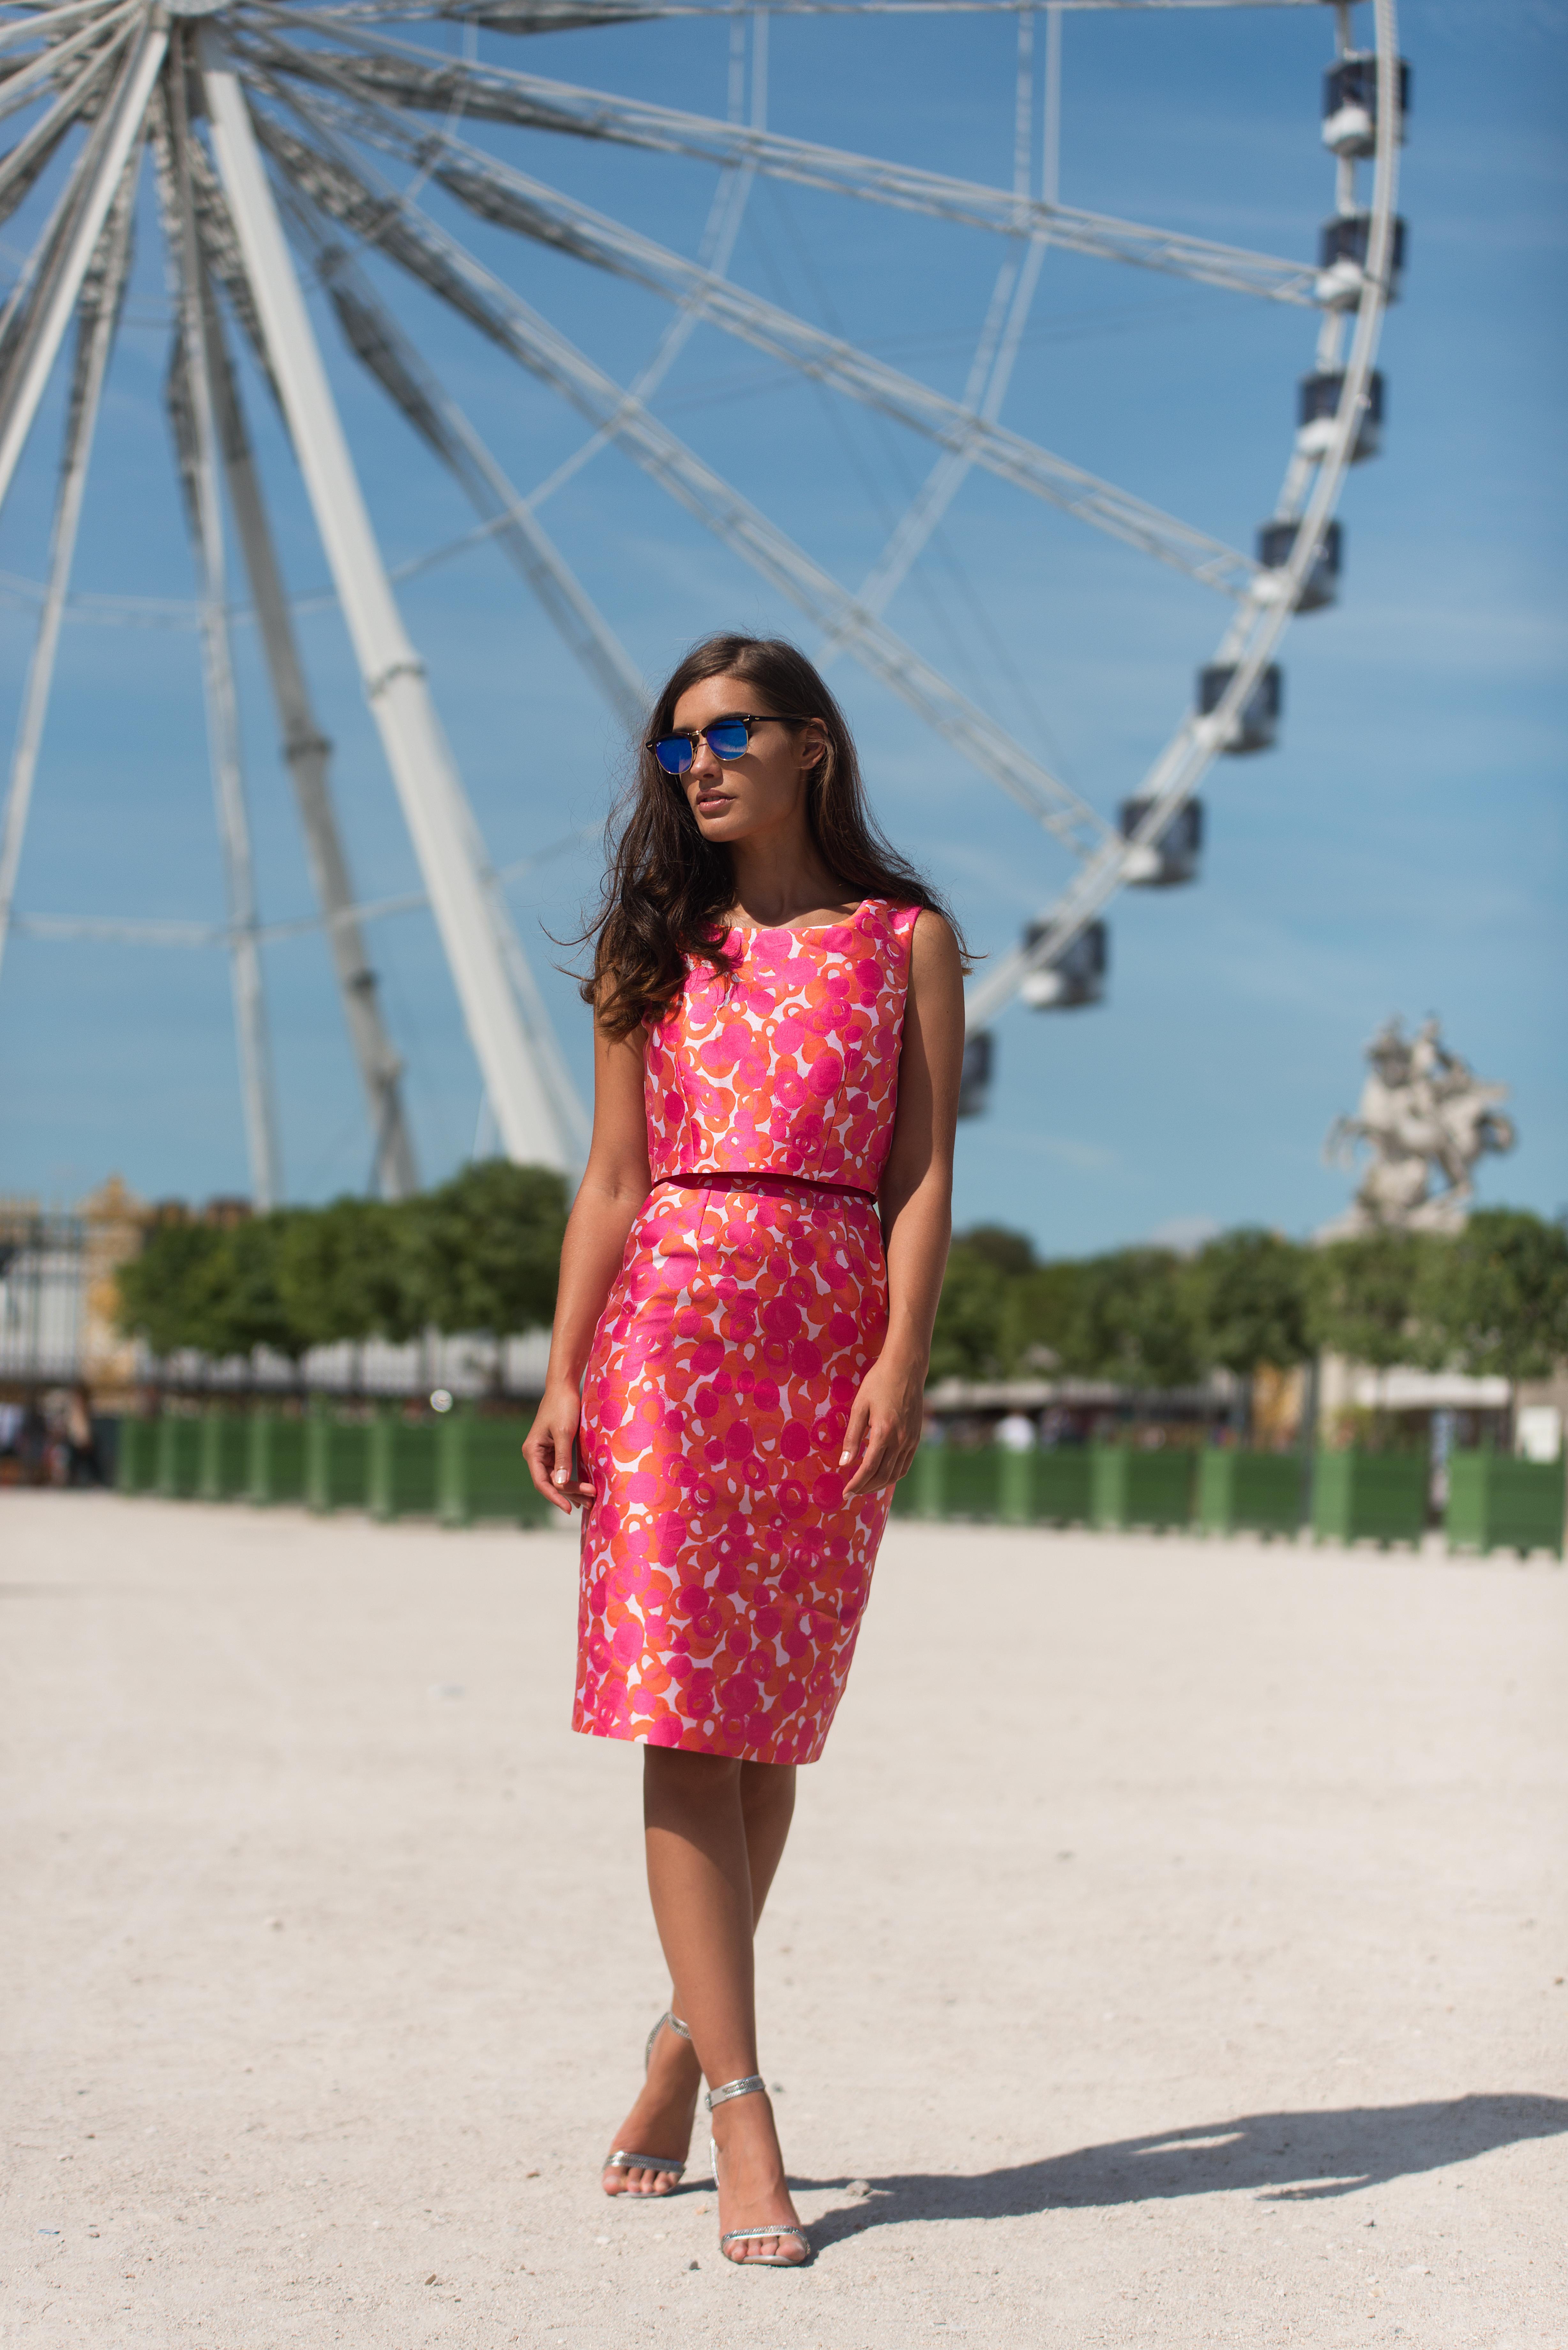 17 Piri Dress 5952 - €339 - £269